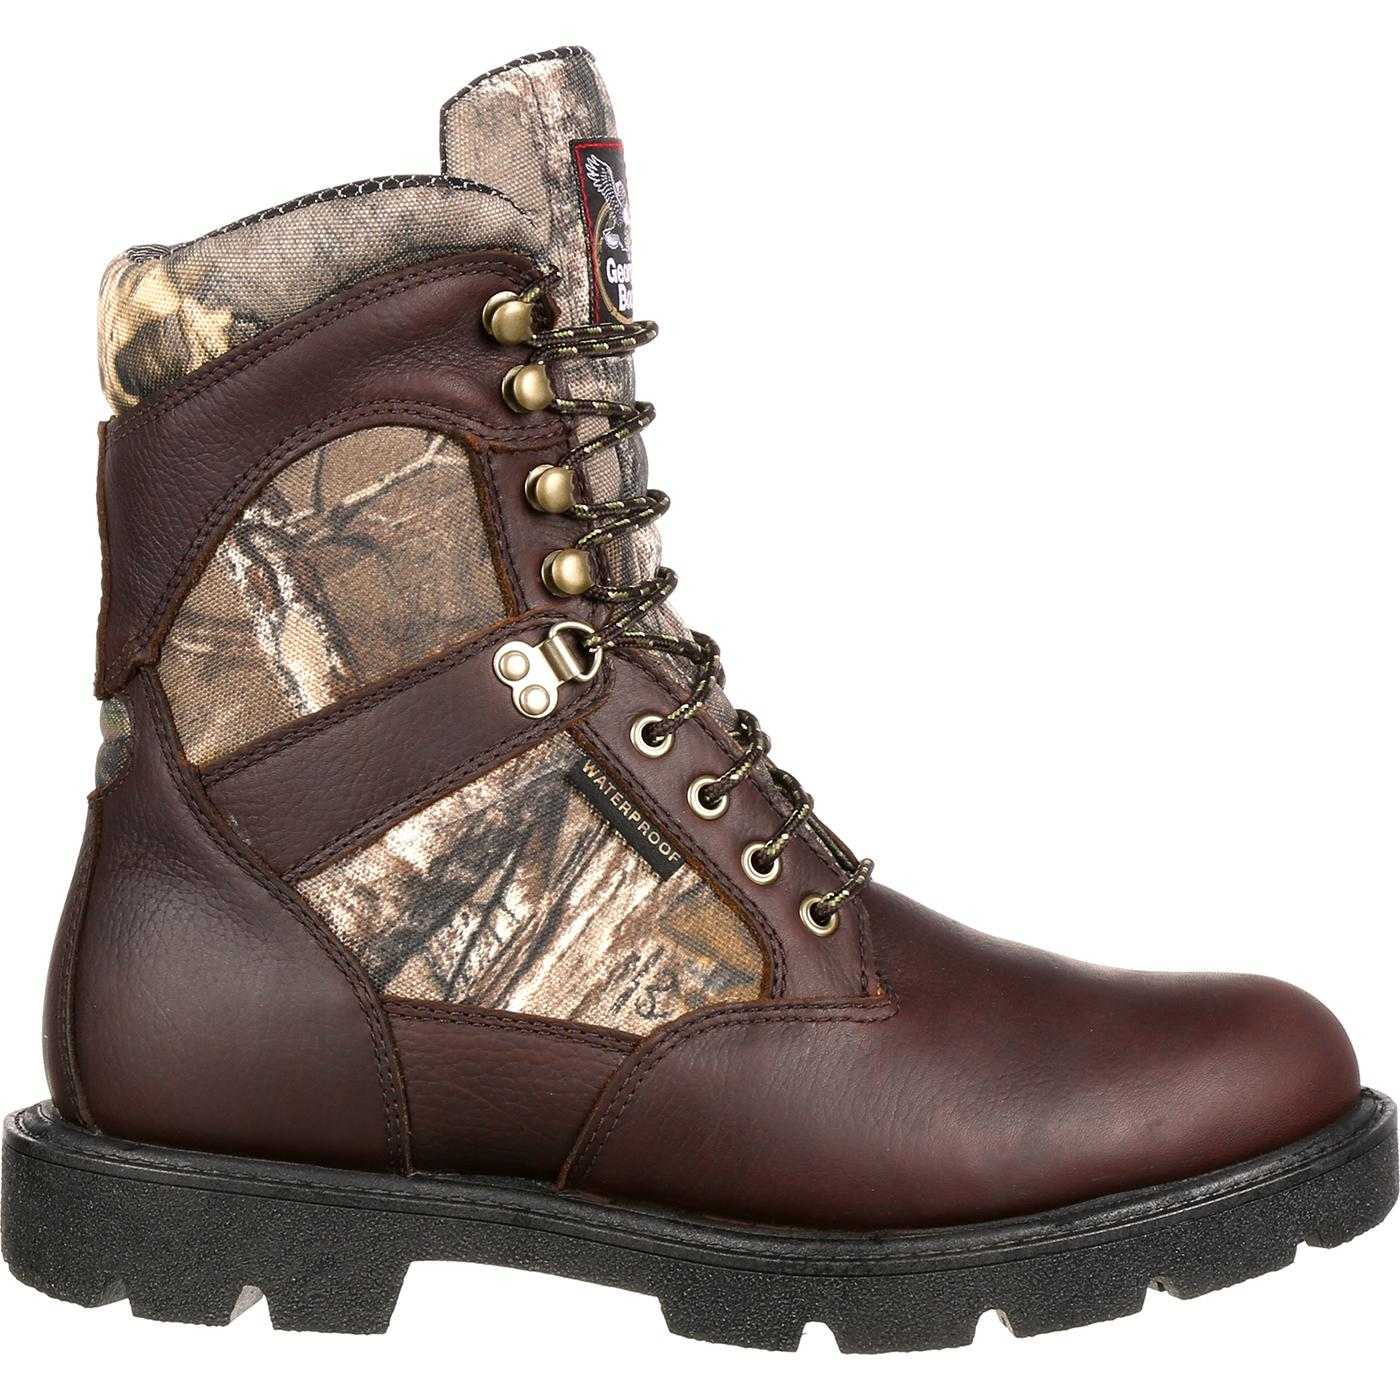 632023a9e41b Waterproof Insulated Work Hikers  Georgia Boot Homeland